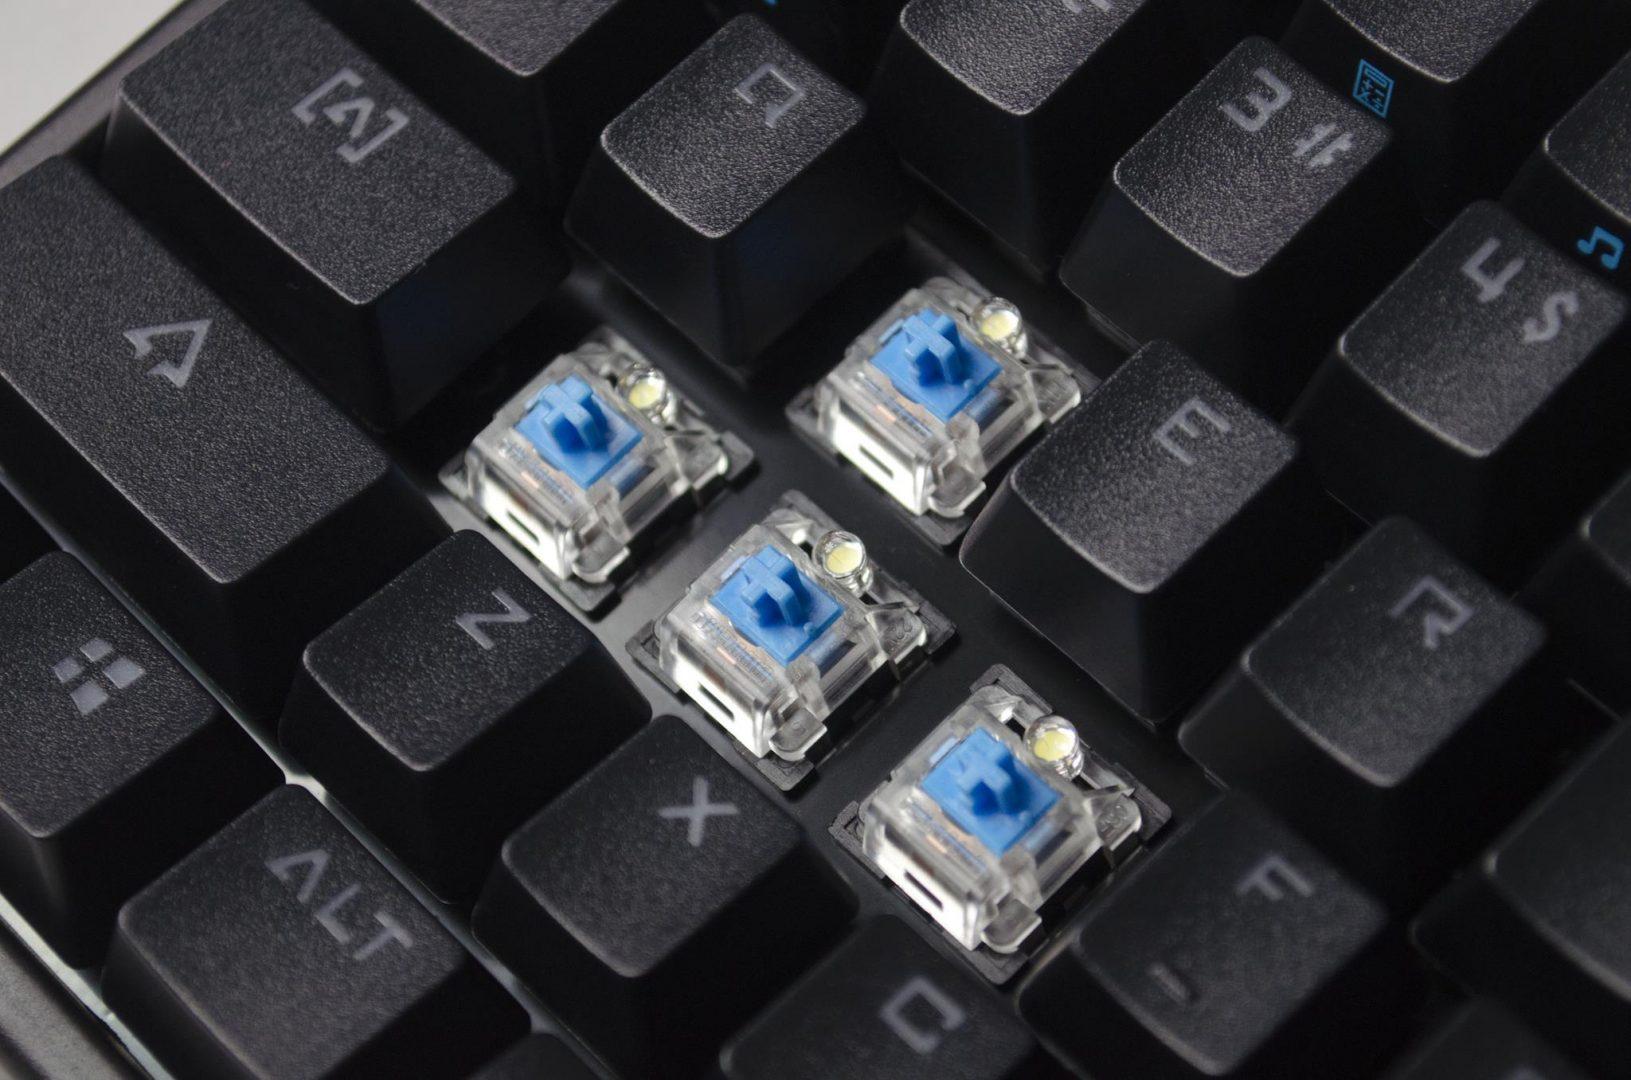 drevo gramr keyboard review_9